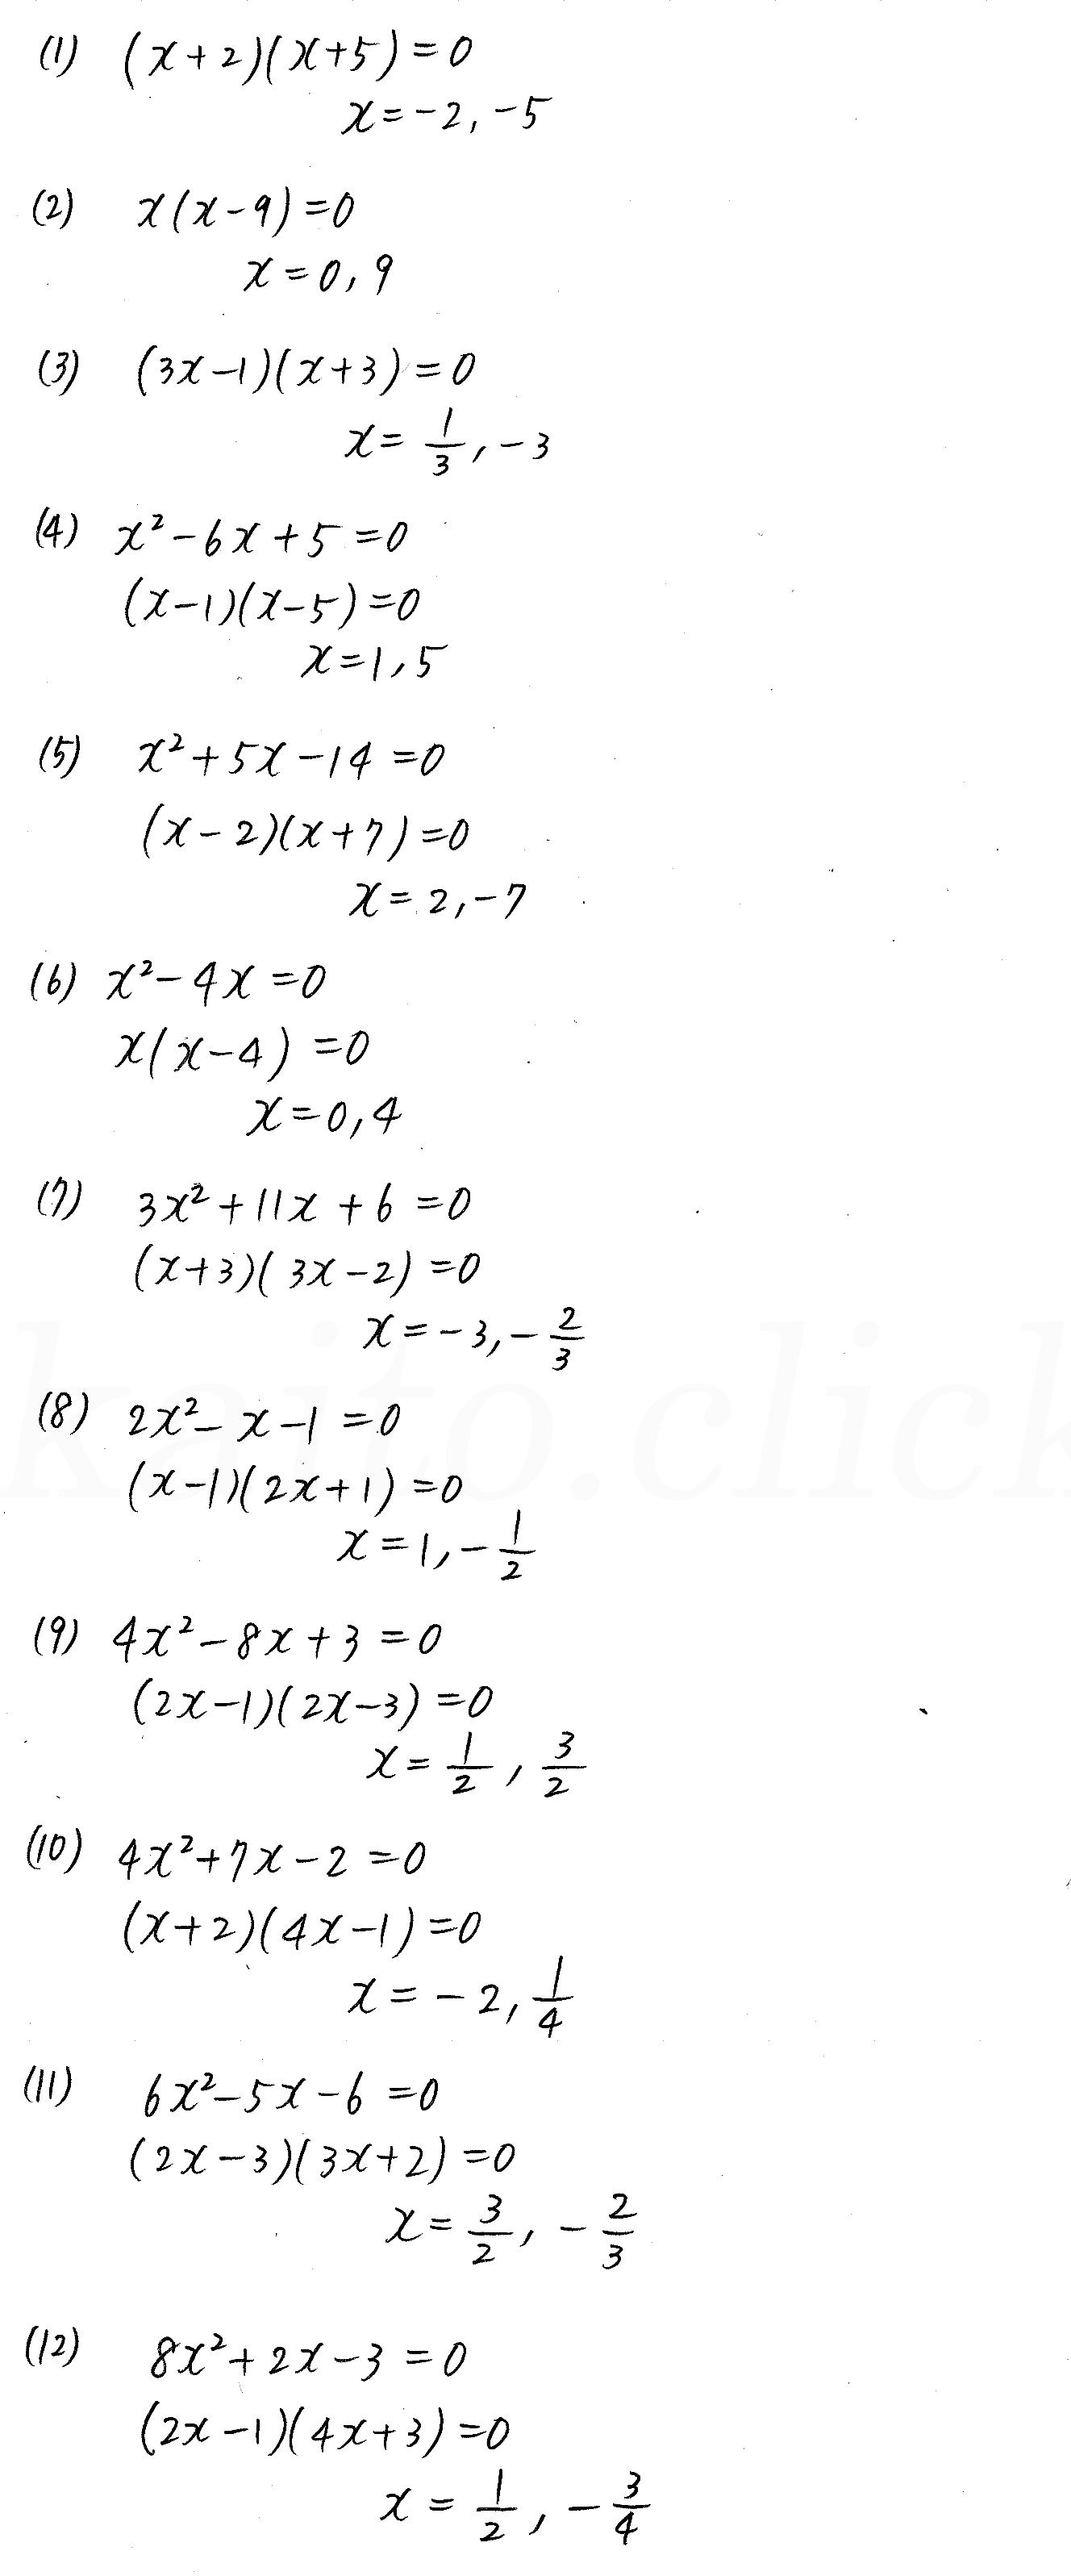 3TRIAL数学Ⅰ-161解答